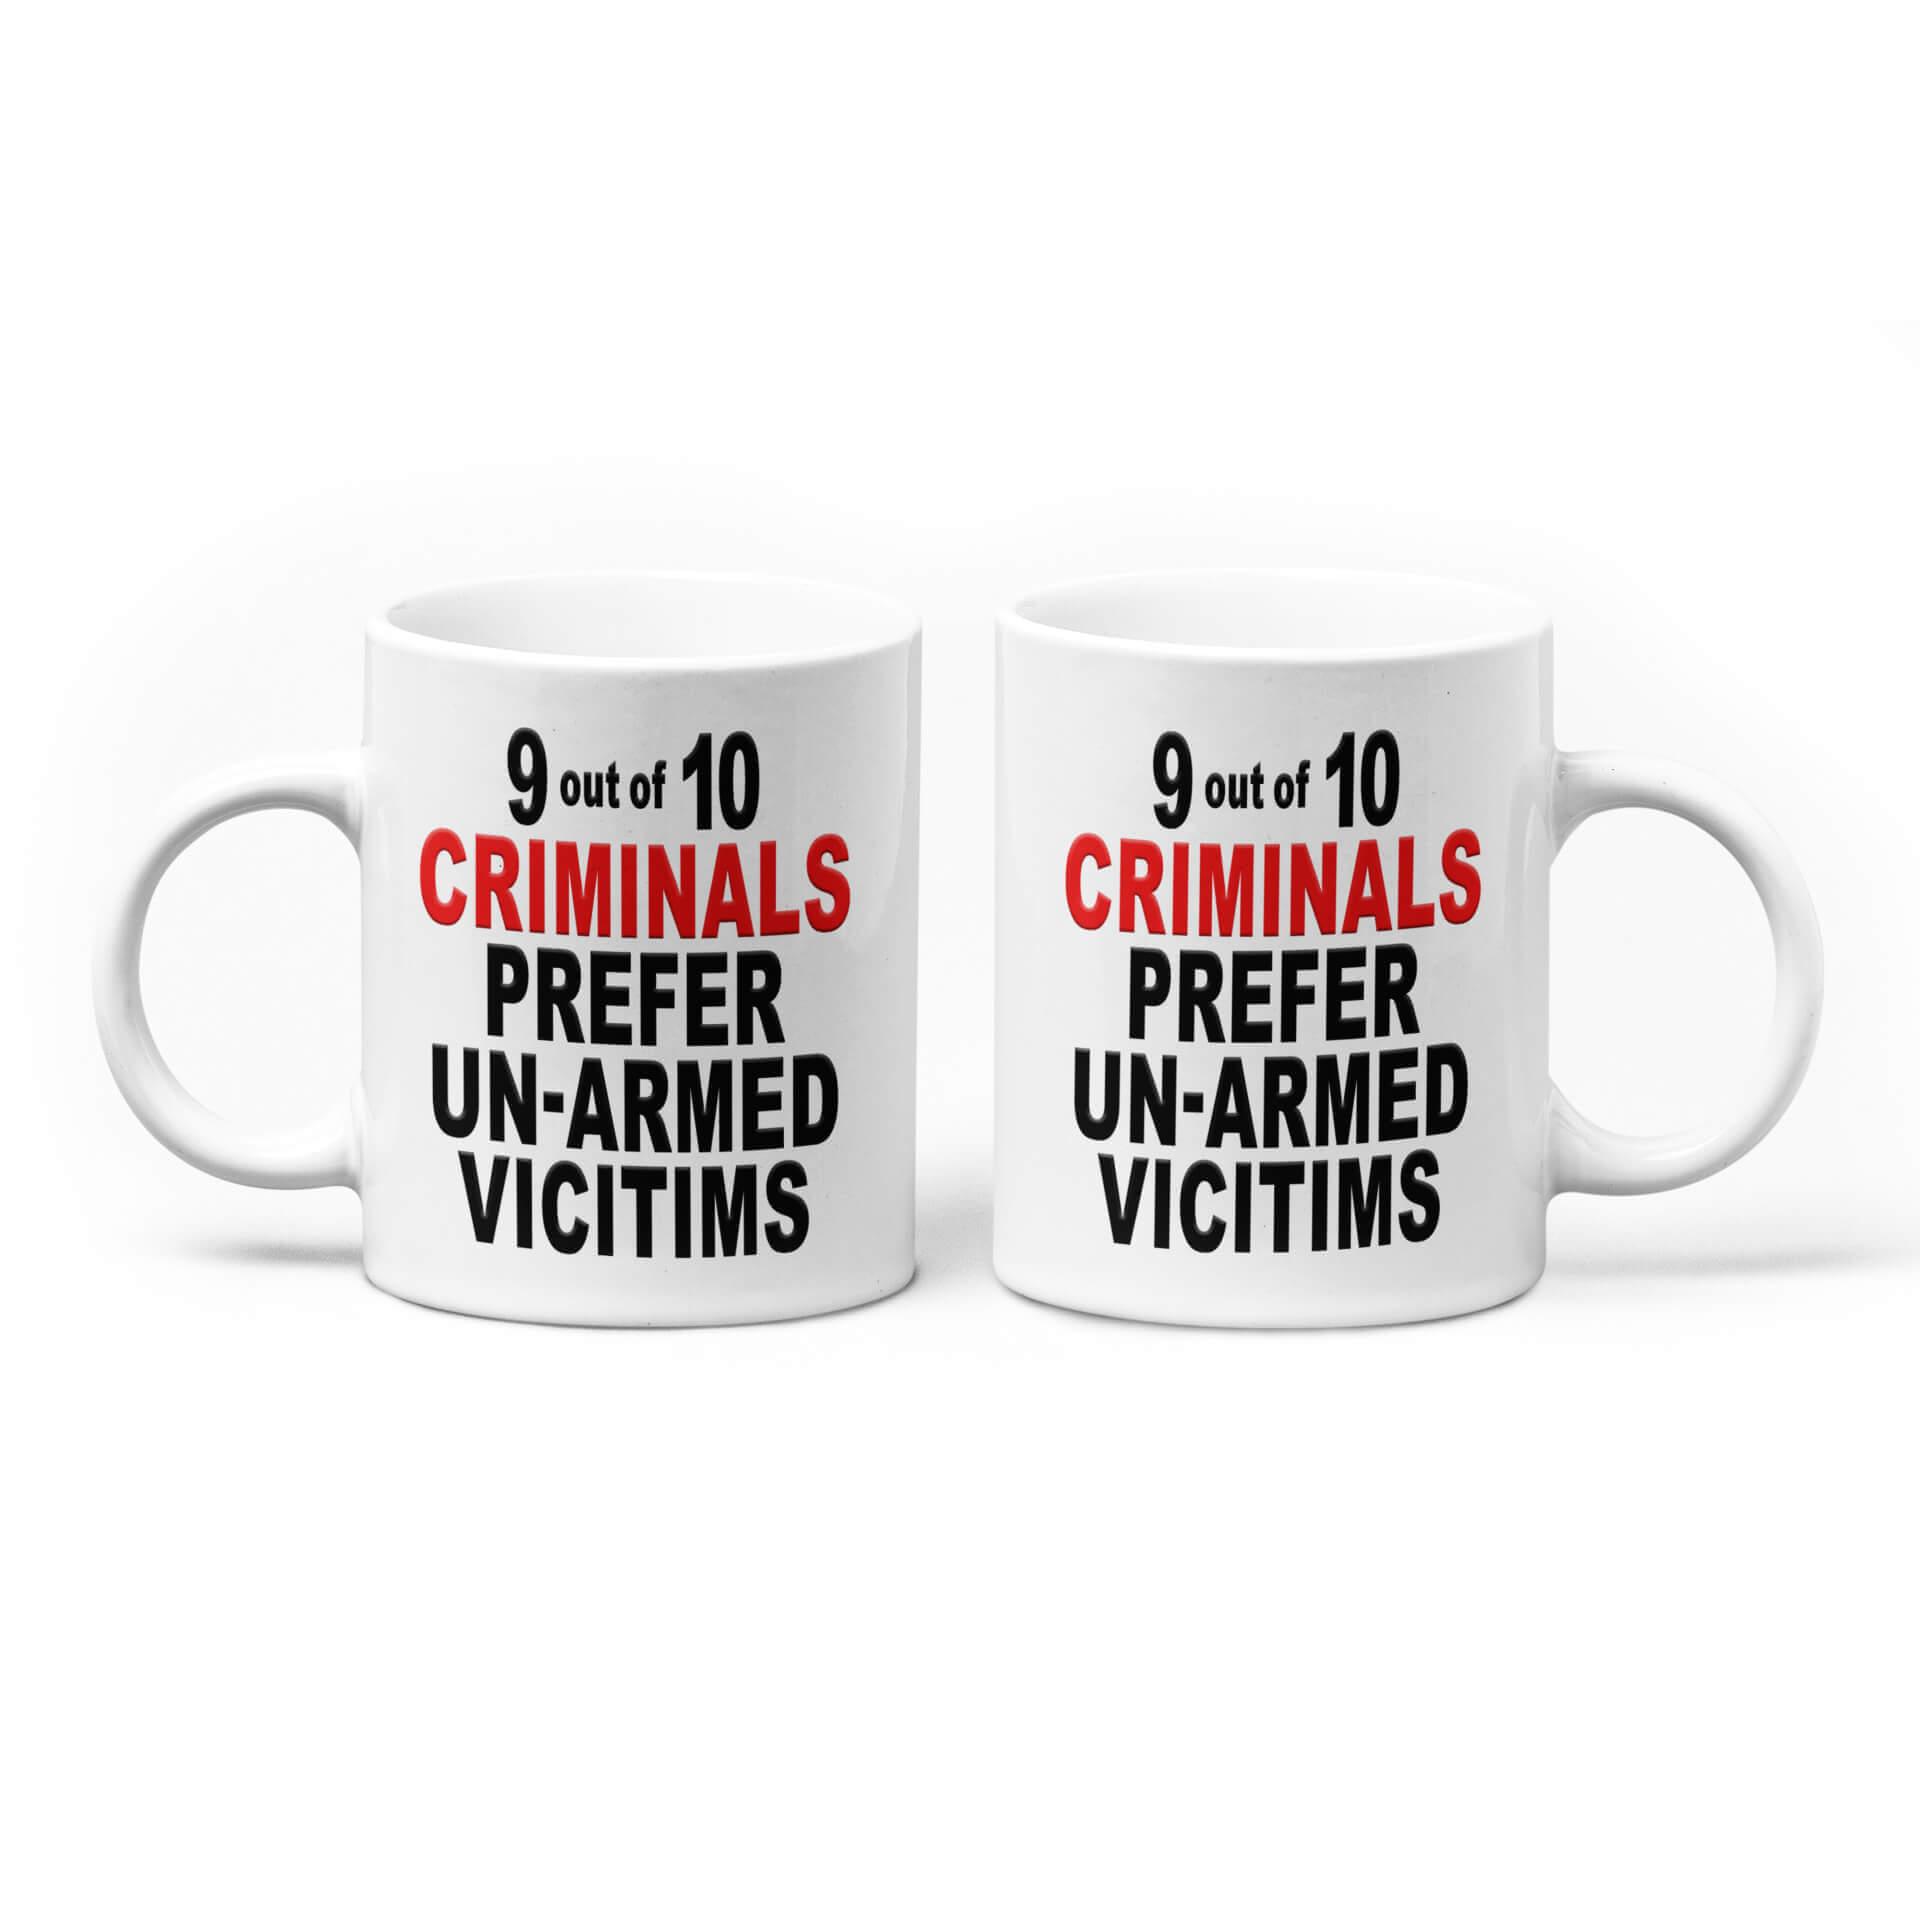 9 out of 10 Criminals Prefer Un-Armed Victims Mug